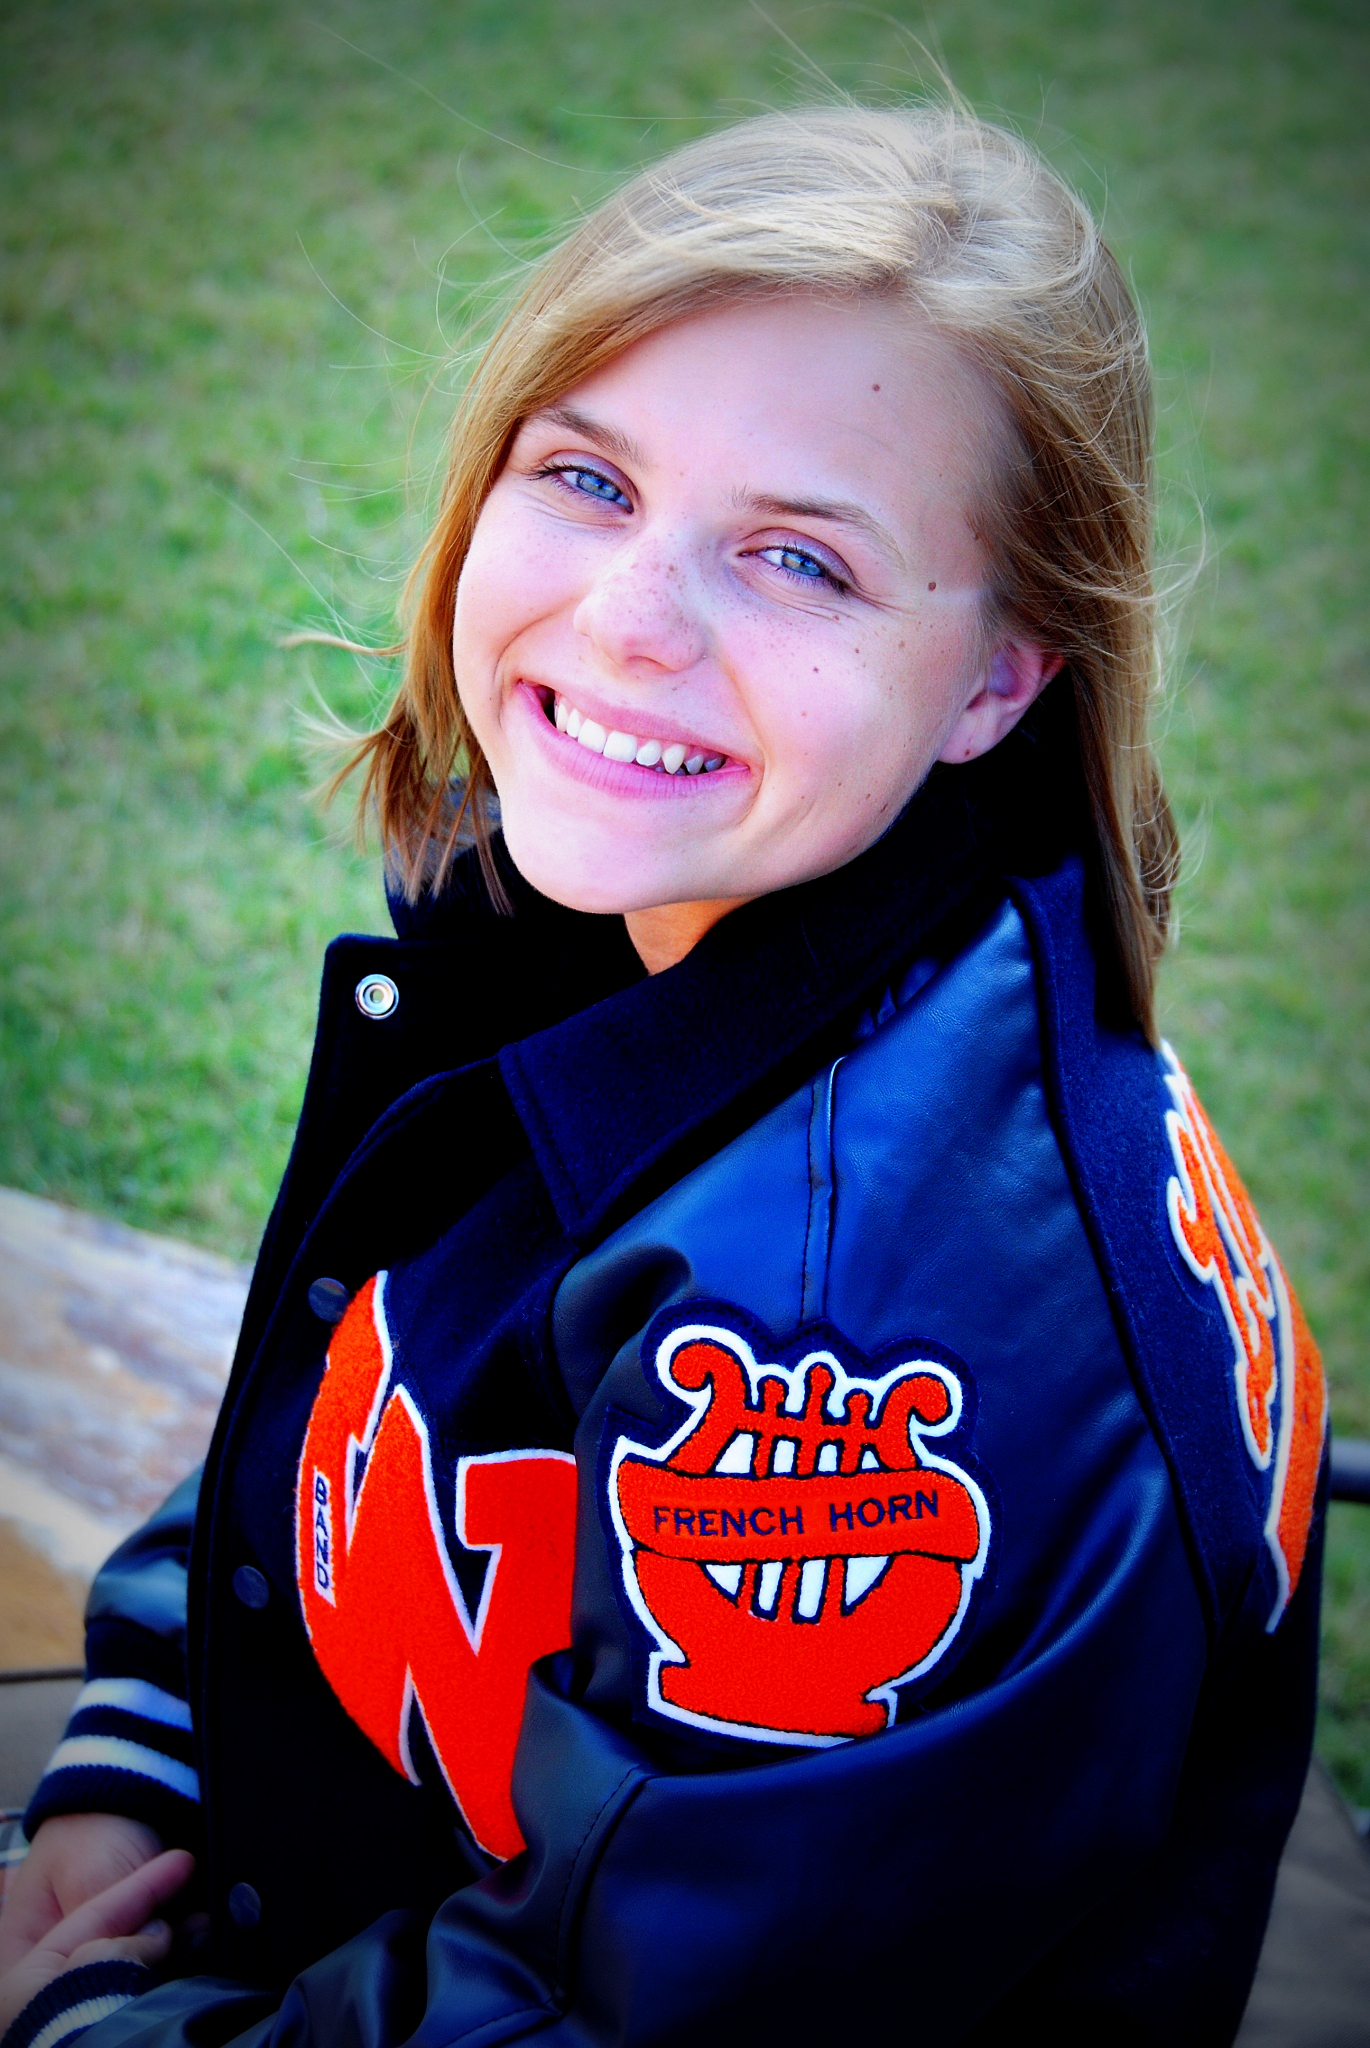 2008 AUG emi letter jacket 1 2388